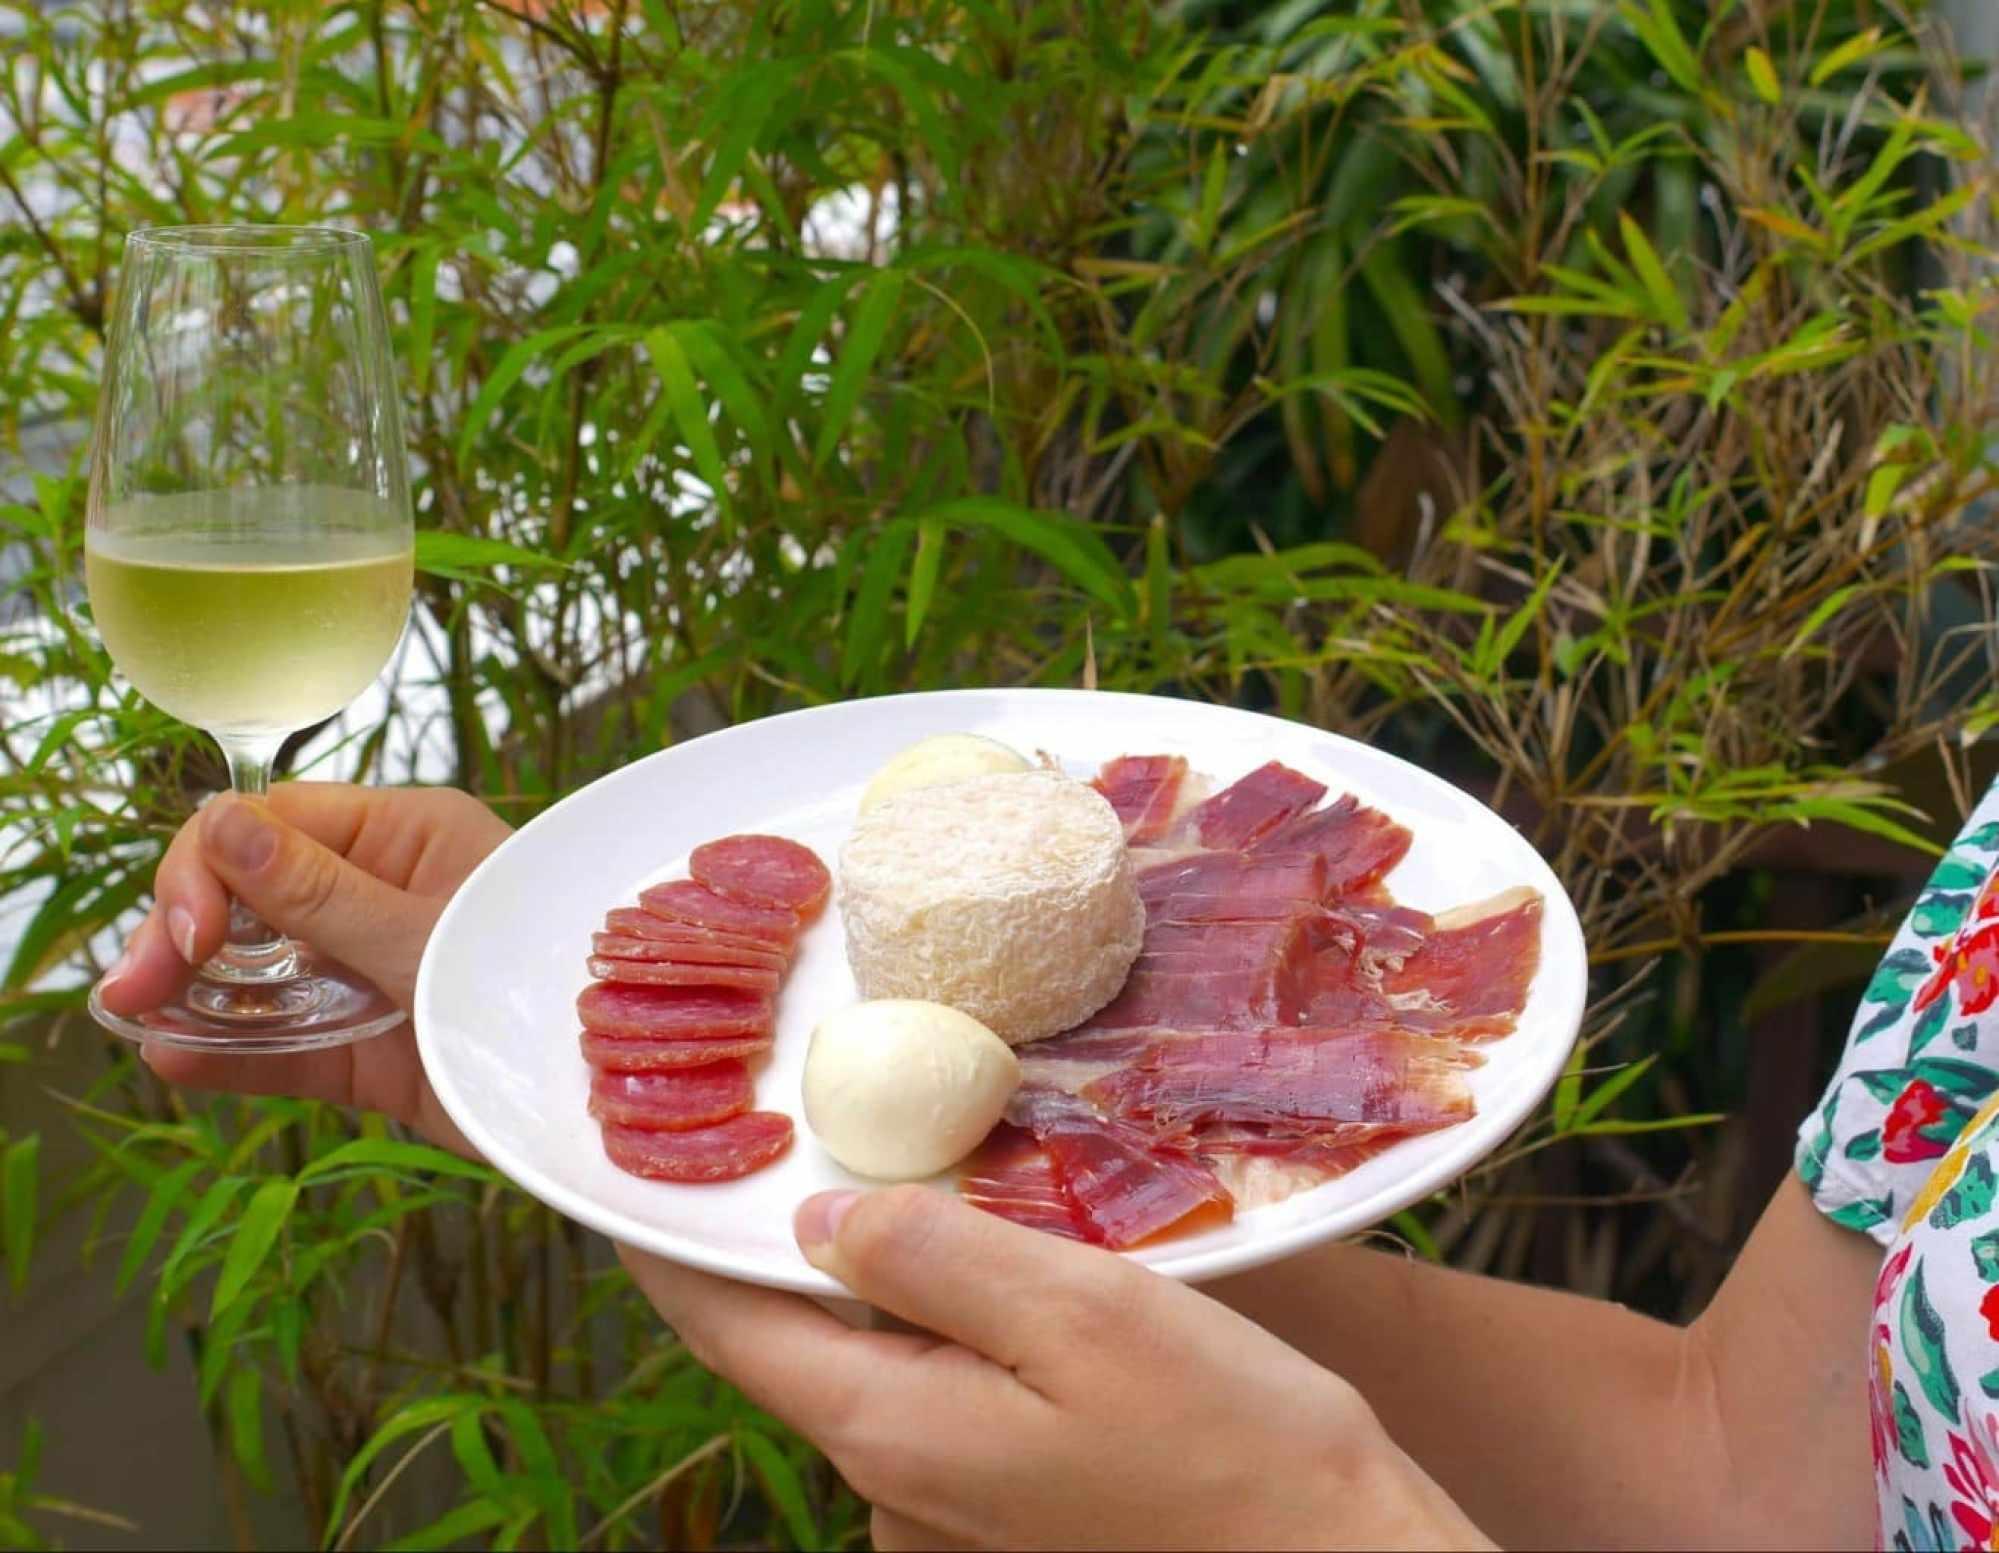 Ham, mozzarella and goat cheese with Friulano wine